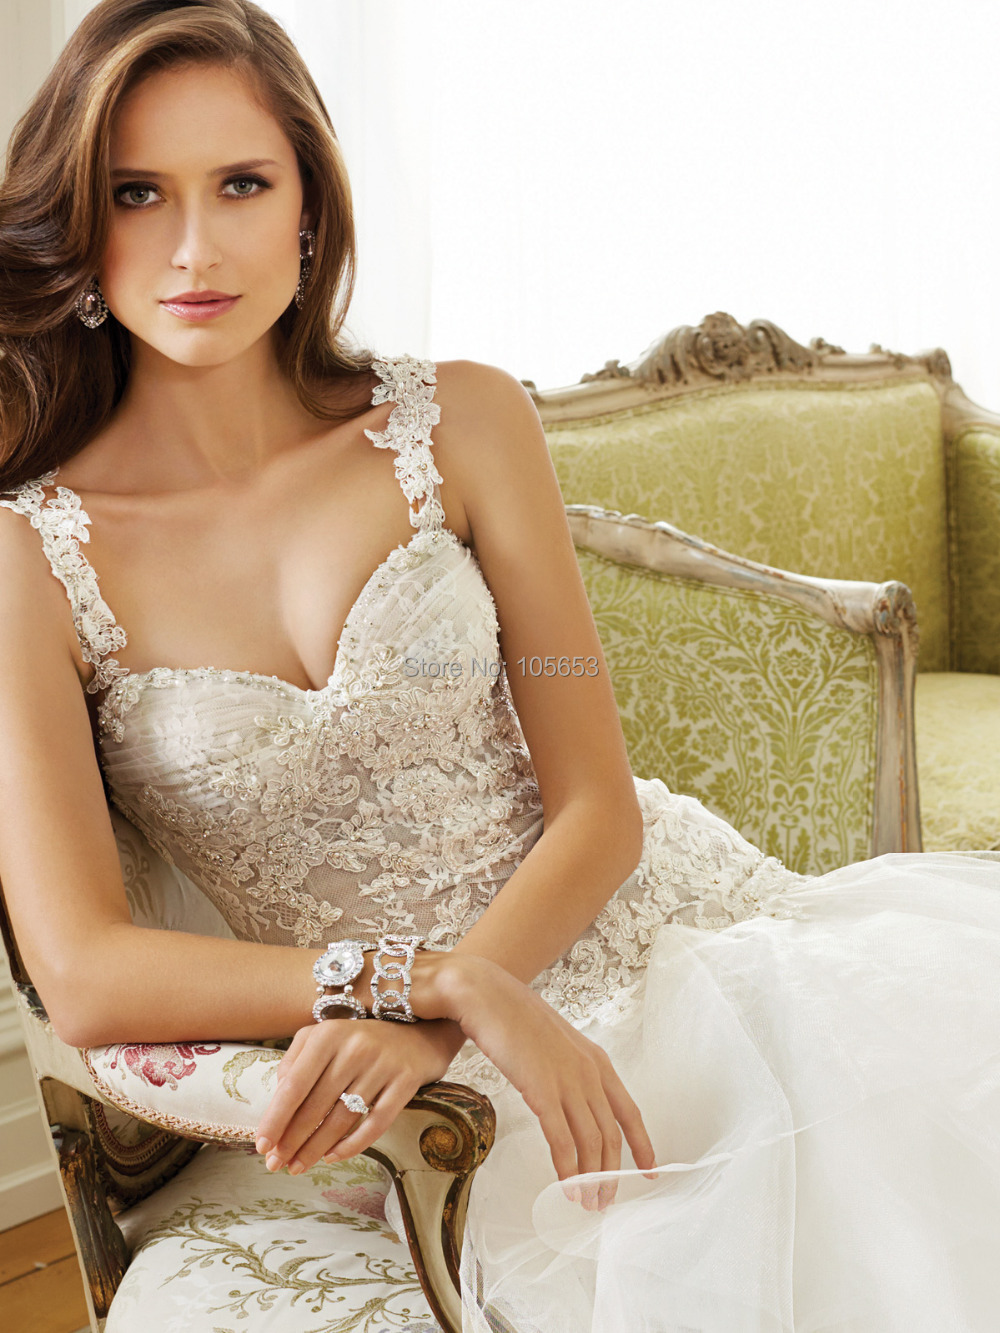 Fashion Mermaid Sweetheart Long Lace Beaded Detachable Straps Wedding Dress  2017 Bridal Gown Vestido De Noiva ZY195 In Wedding Dresses From Weddings ...